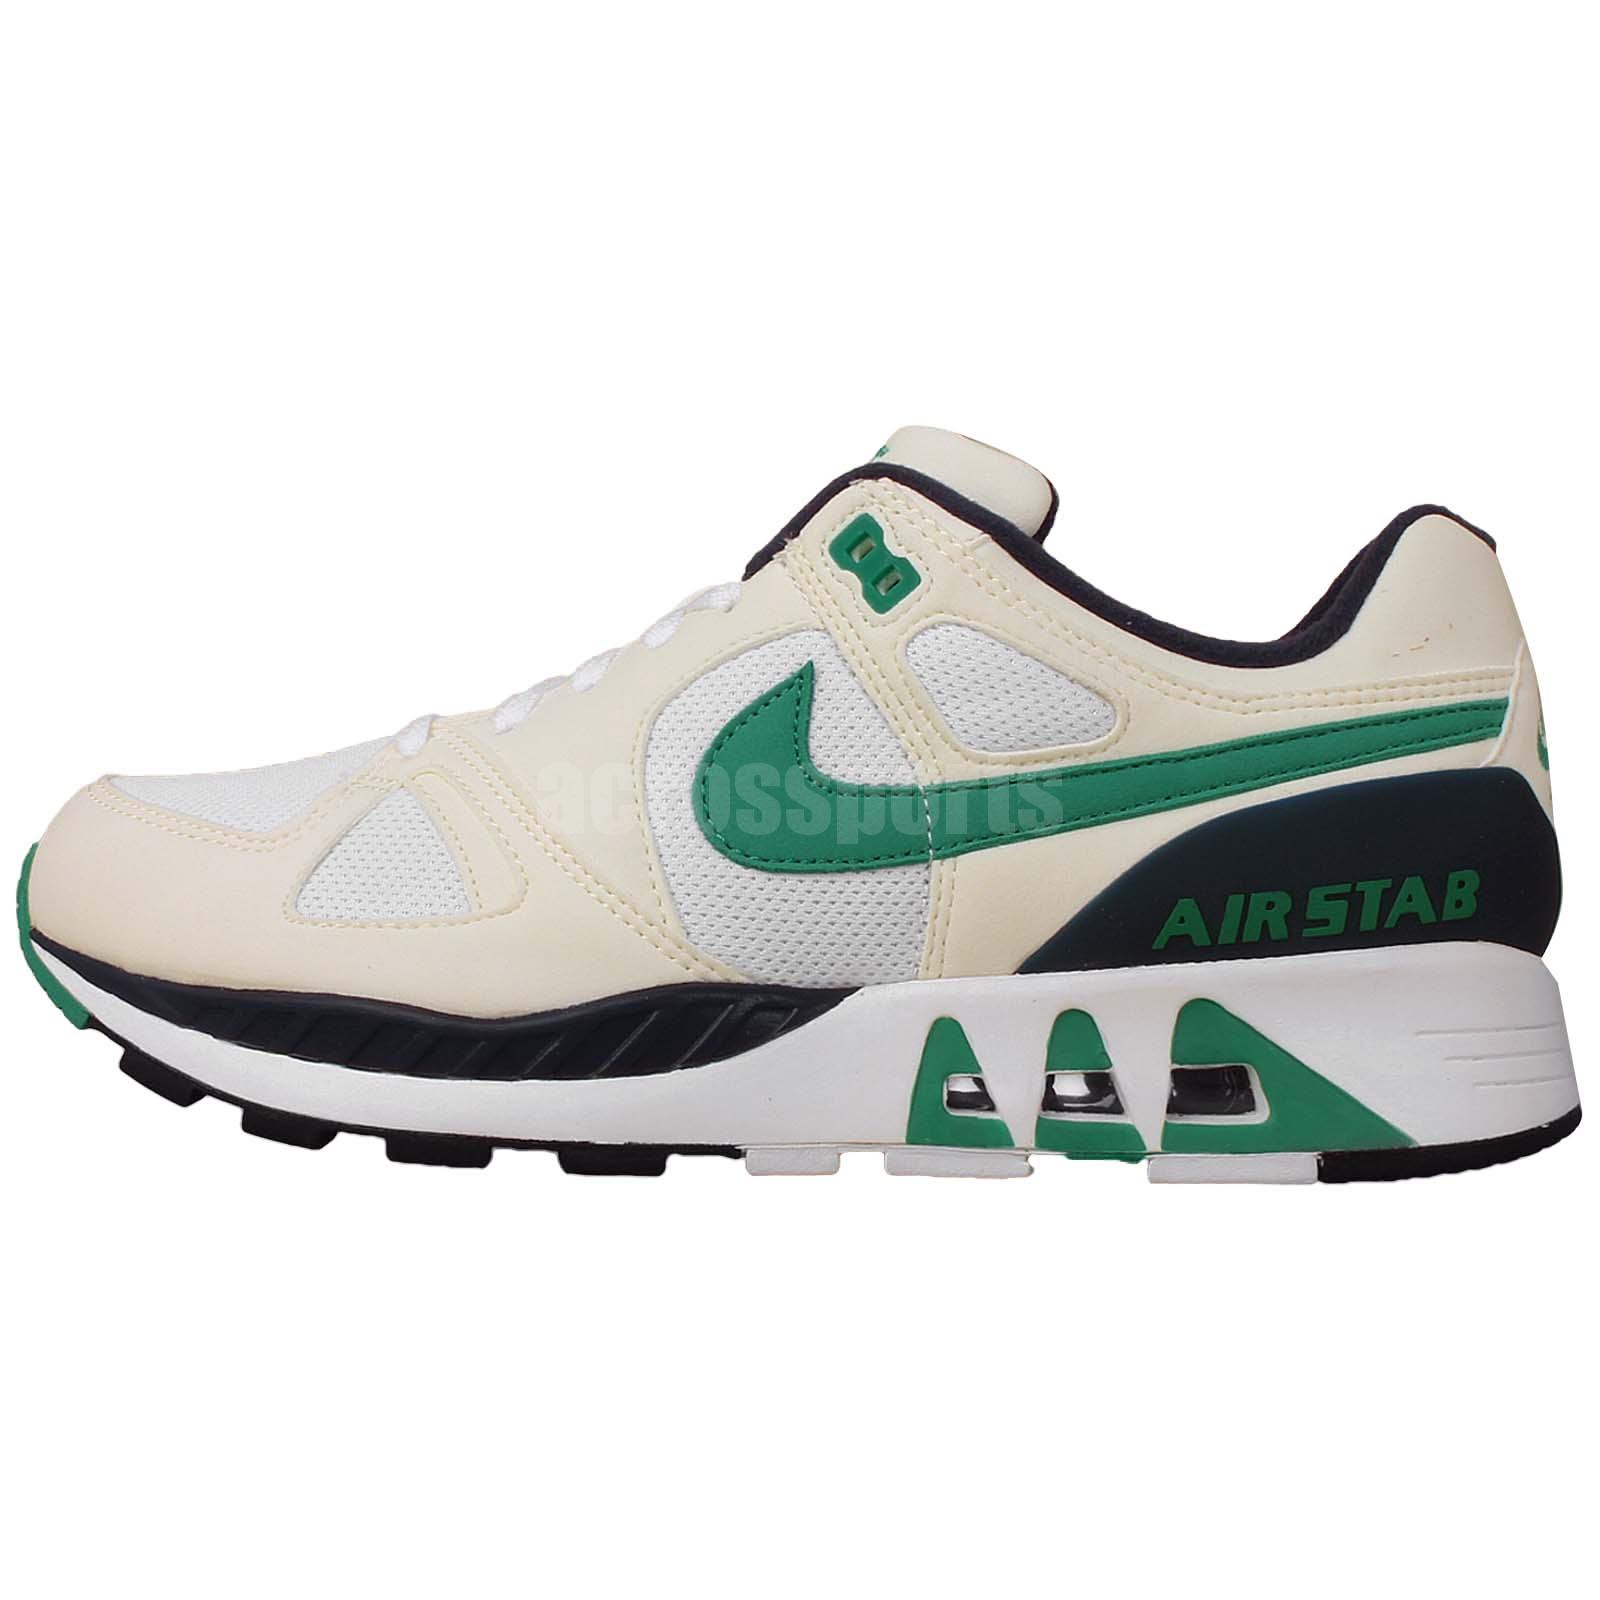 nike air stab white green navy nsw mens retro running